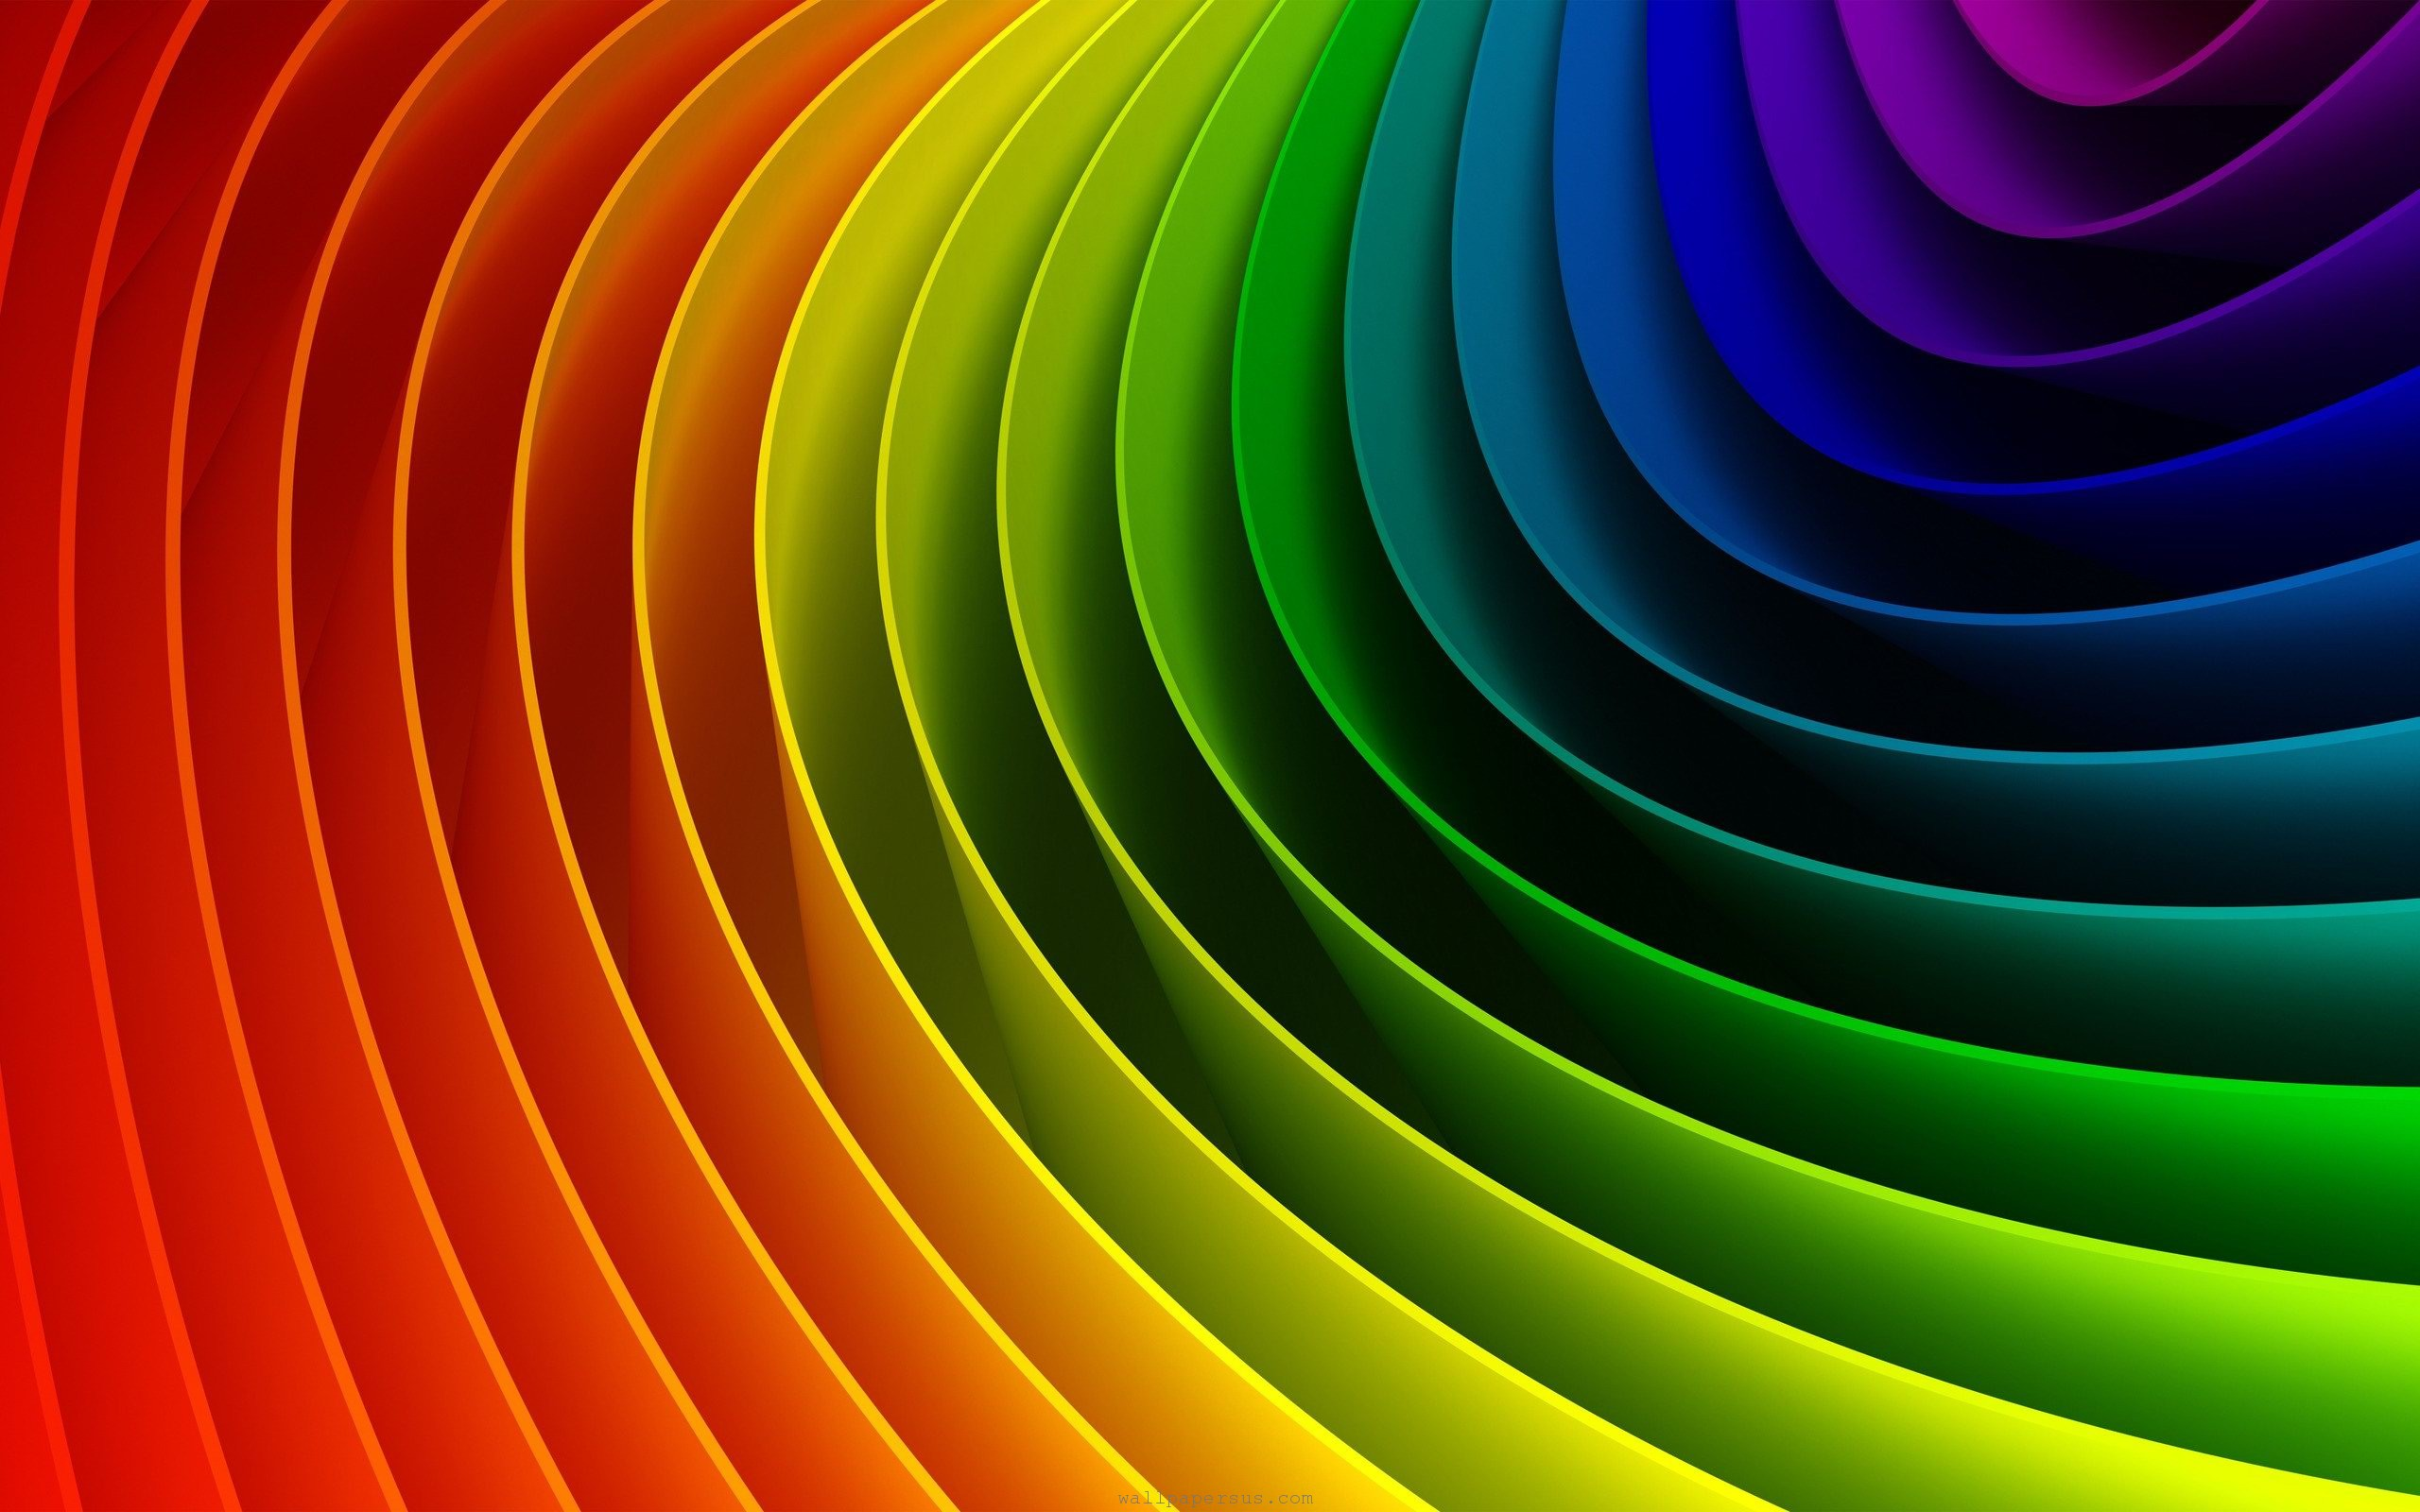 Colorful background wallpaper wallpapersafari for Modern 3d wallpaper